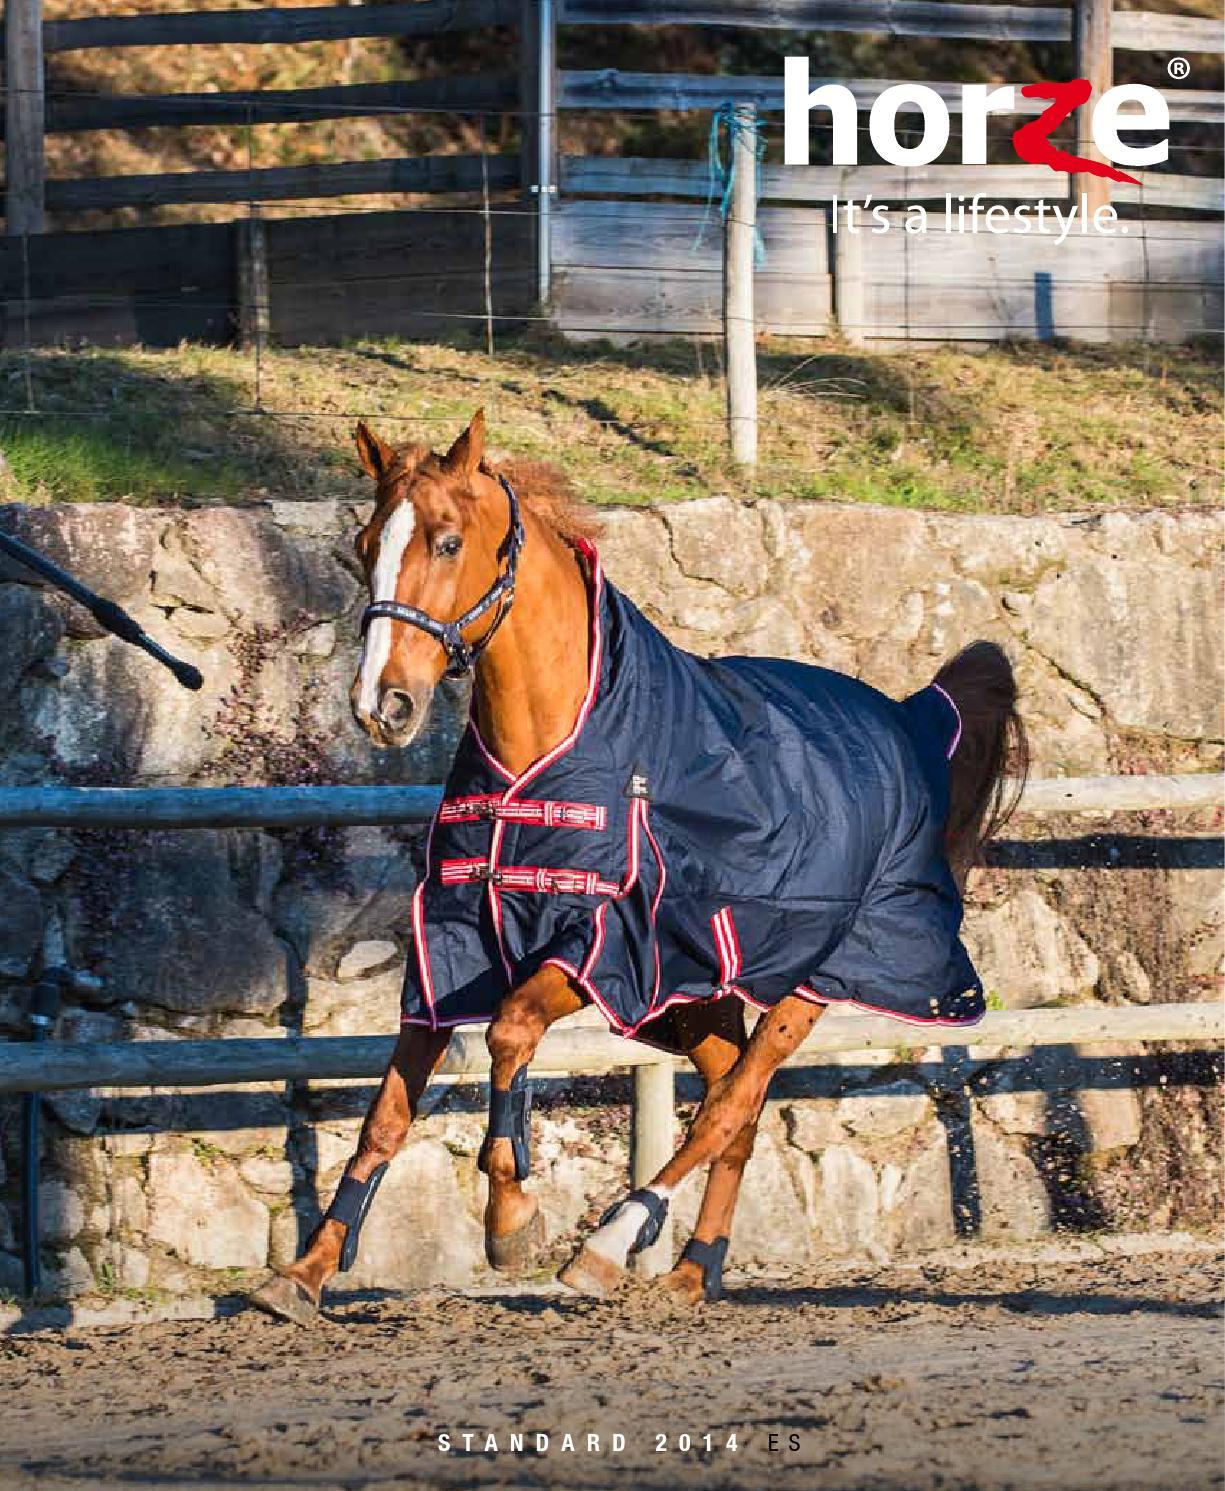 36 BR Invierno T/érmicos Iceland-Botas de equitaci/ón negro